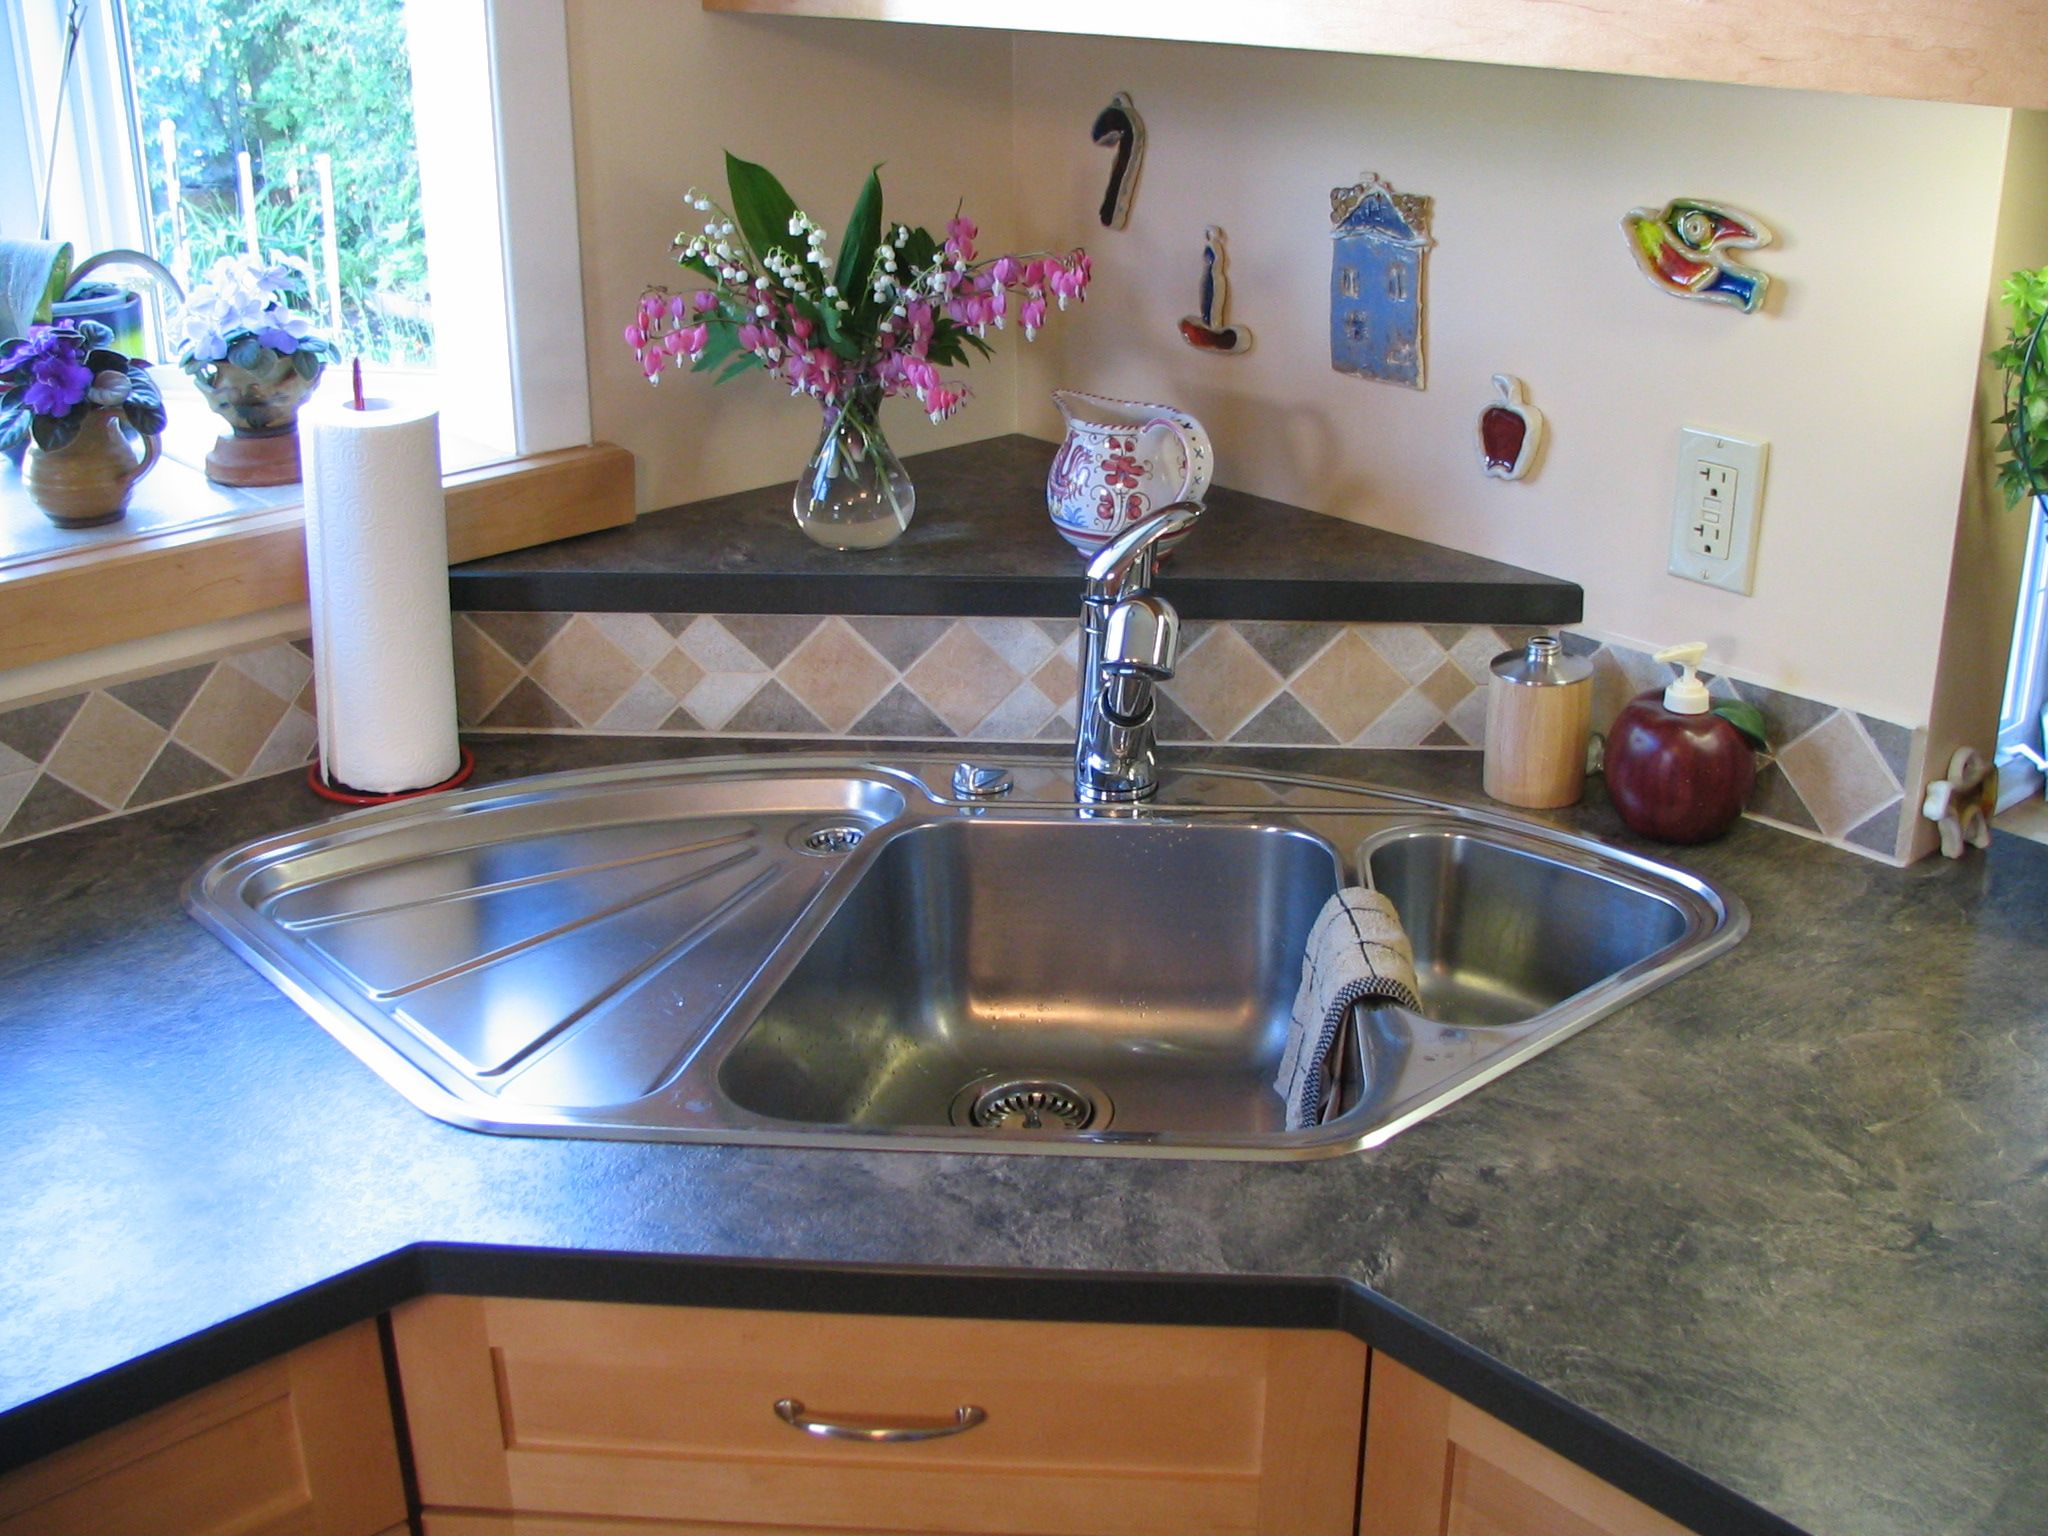 Corner Sinks Kitchen Unit Led Lights Image Result For How To Support A Freestanding